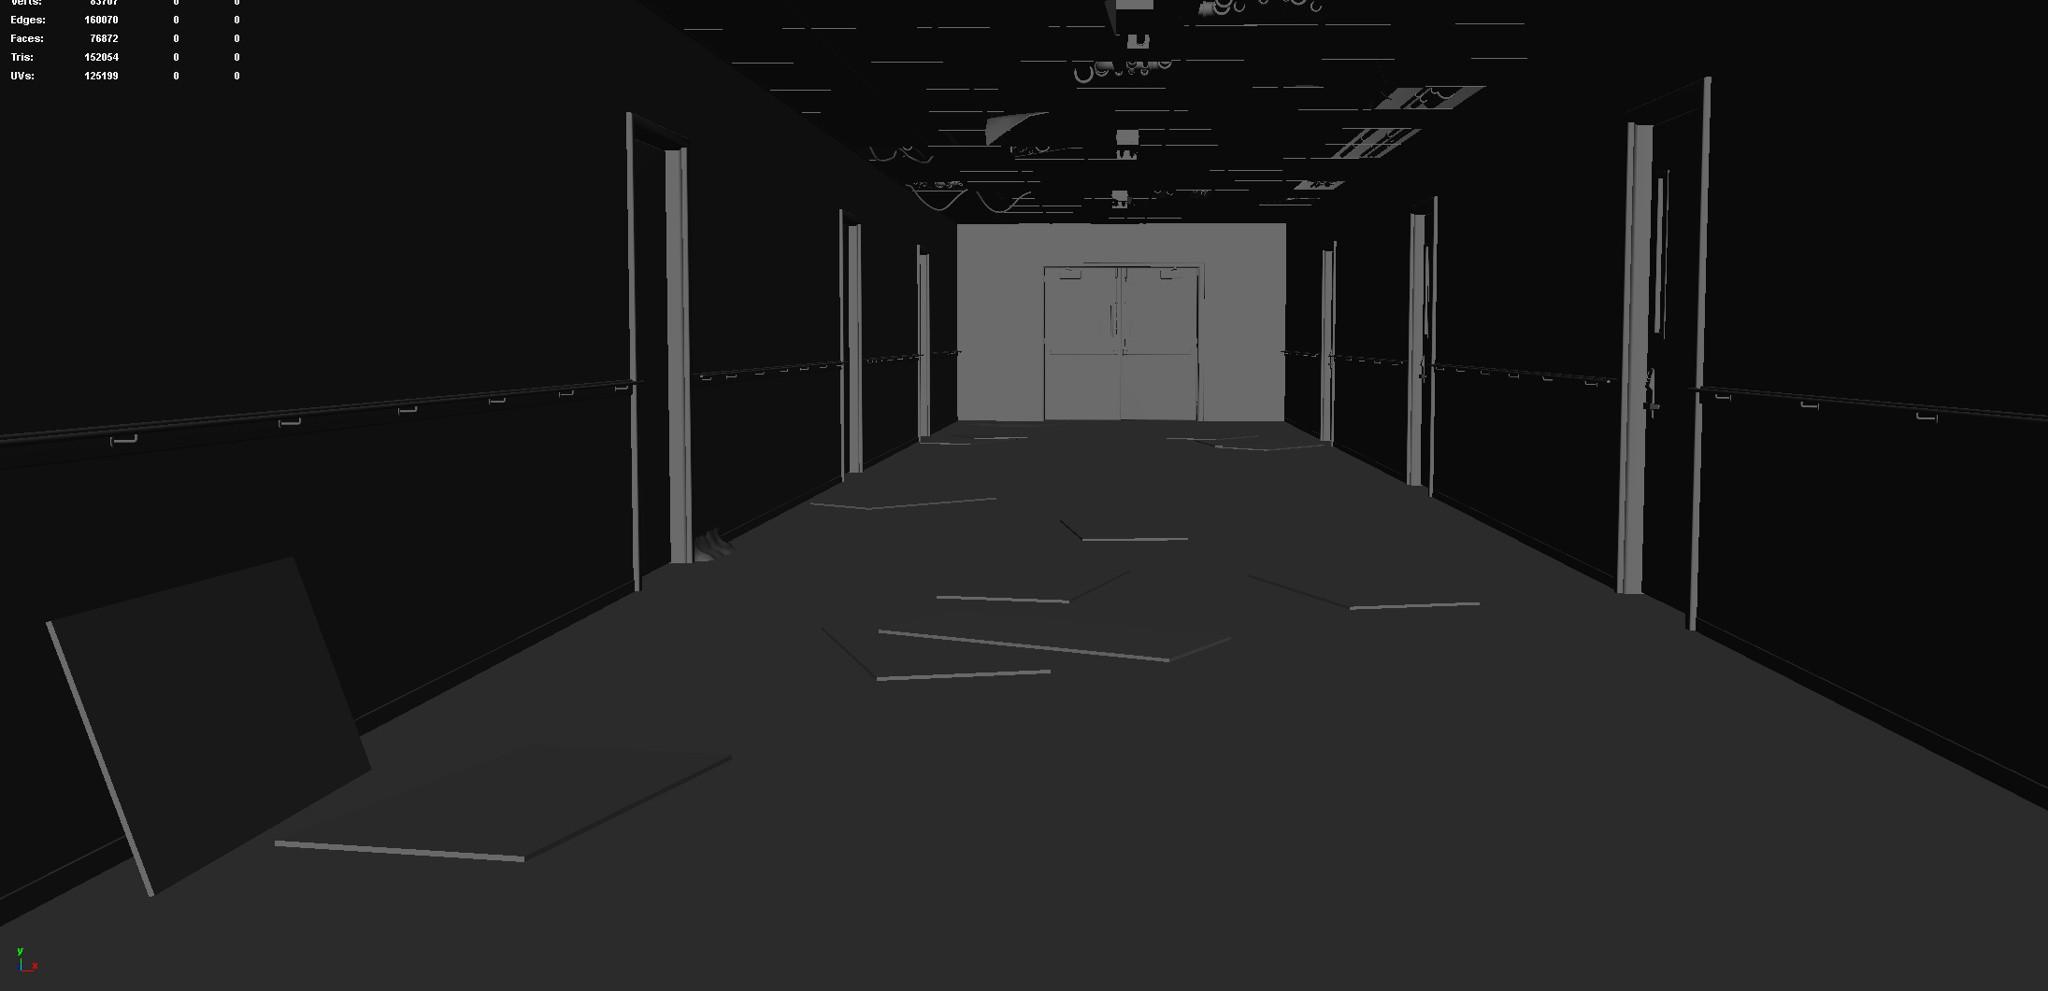 Hallway (Modeling Stage)